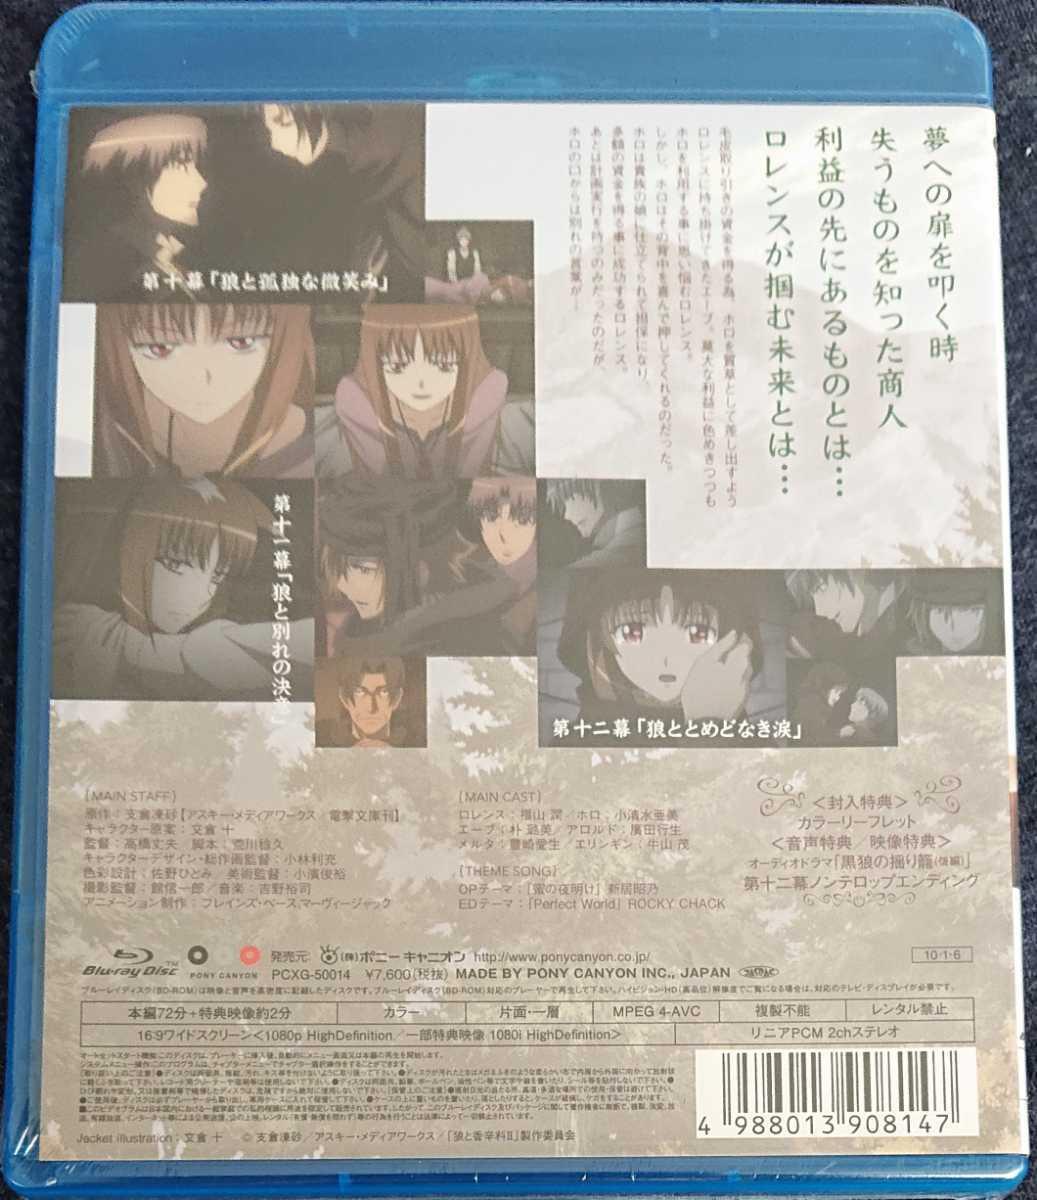 新品即決/送料無料 狼と香辛料II【4】 [Blu-ray] 国内正規品_画像2